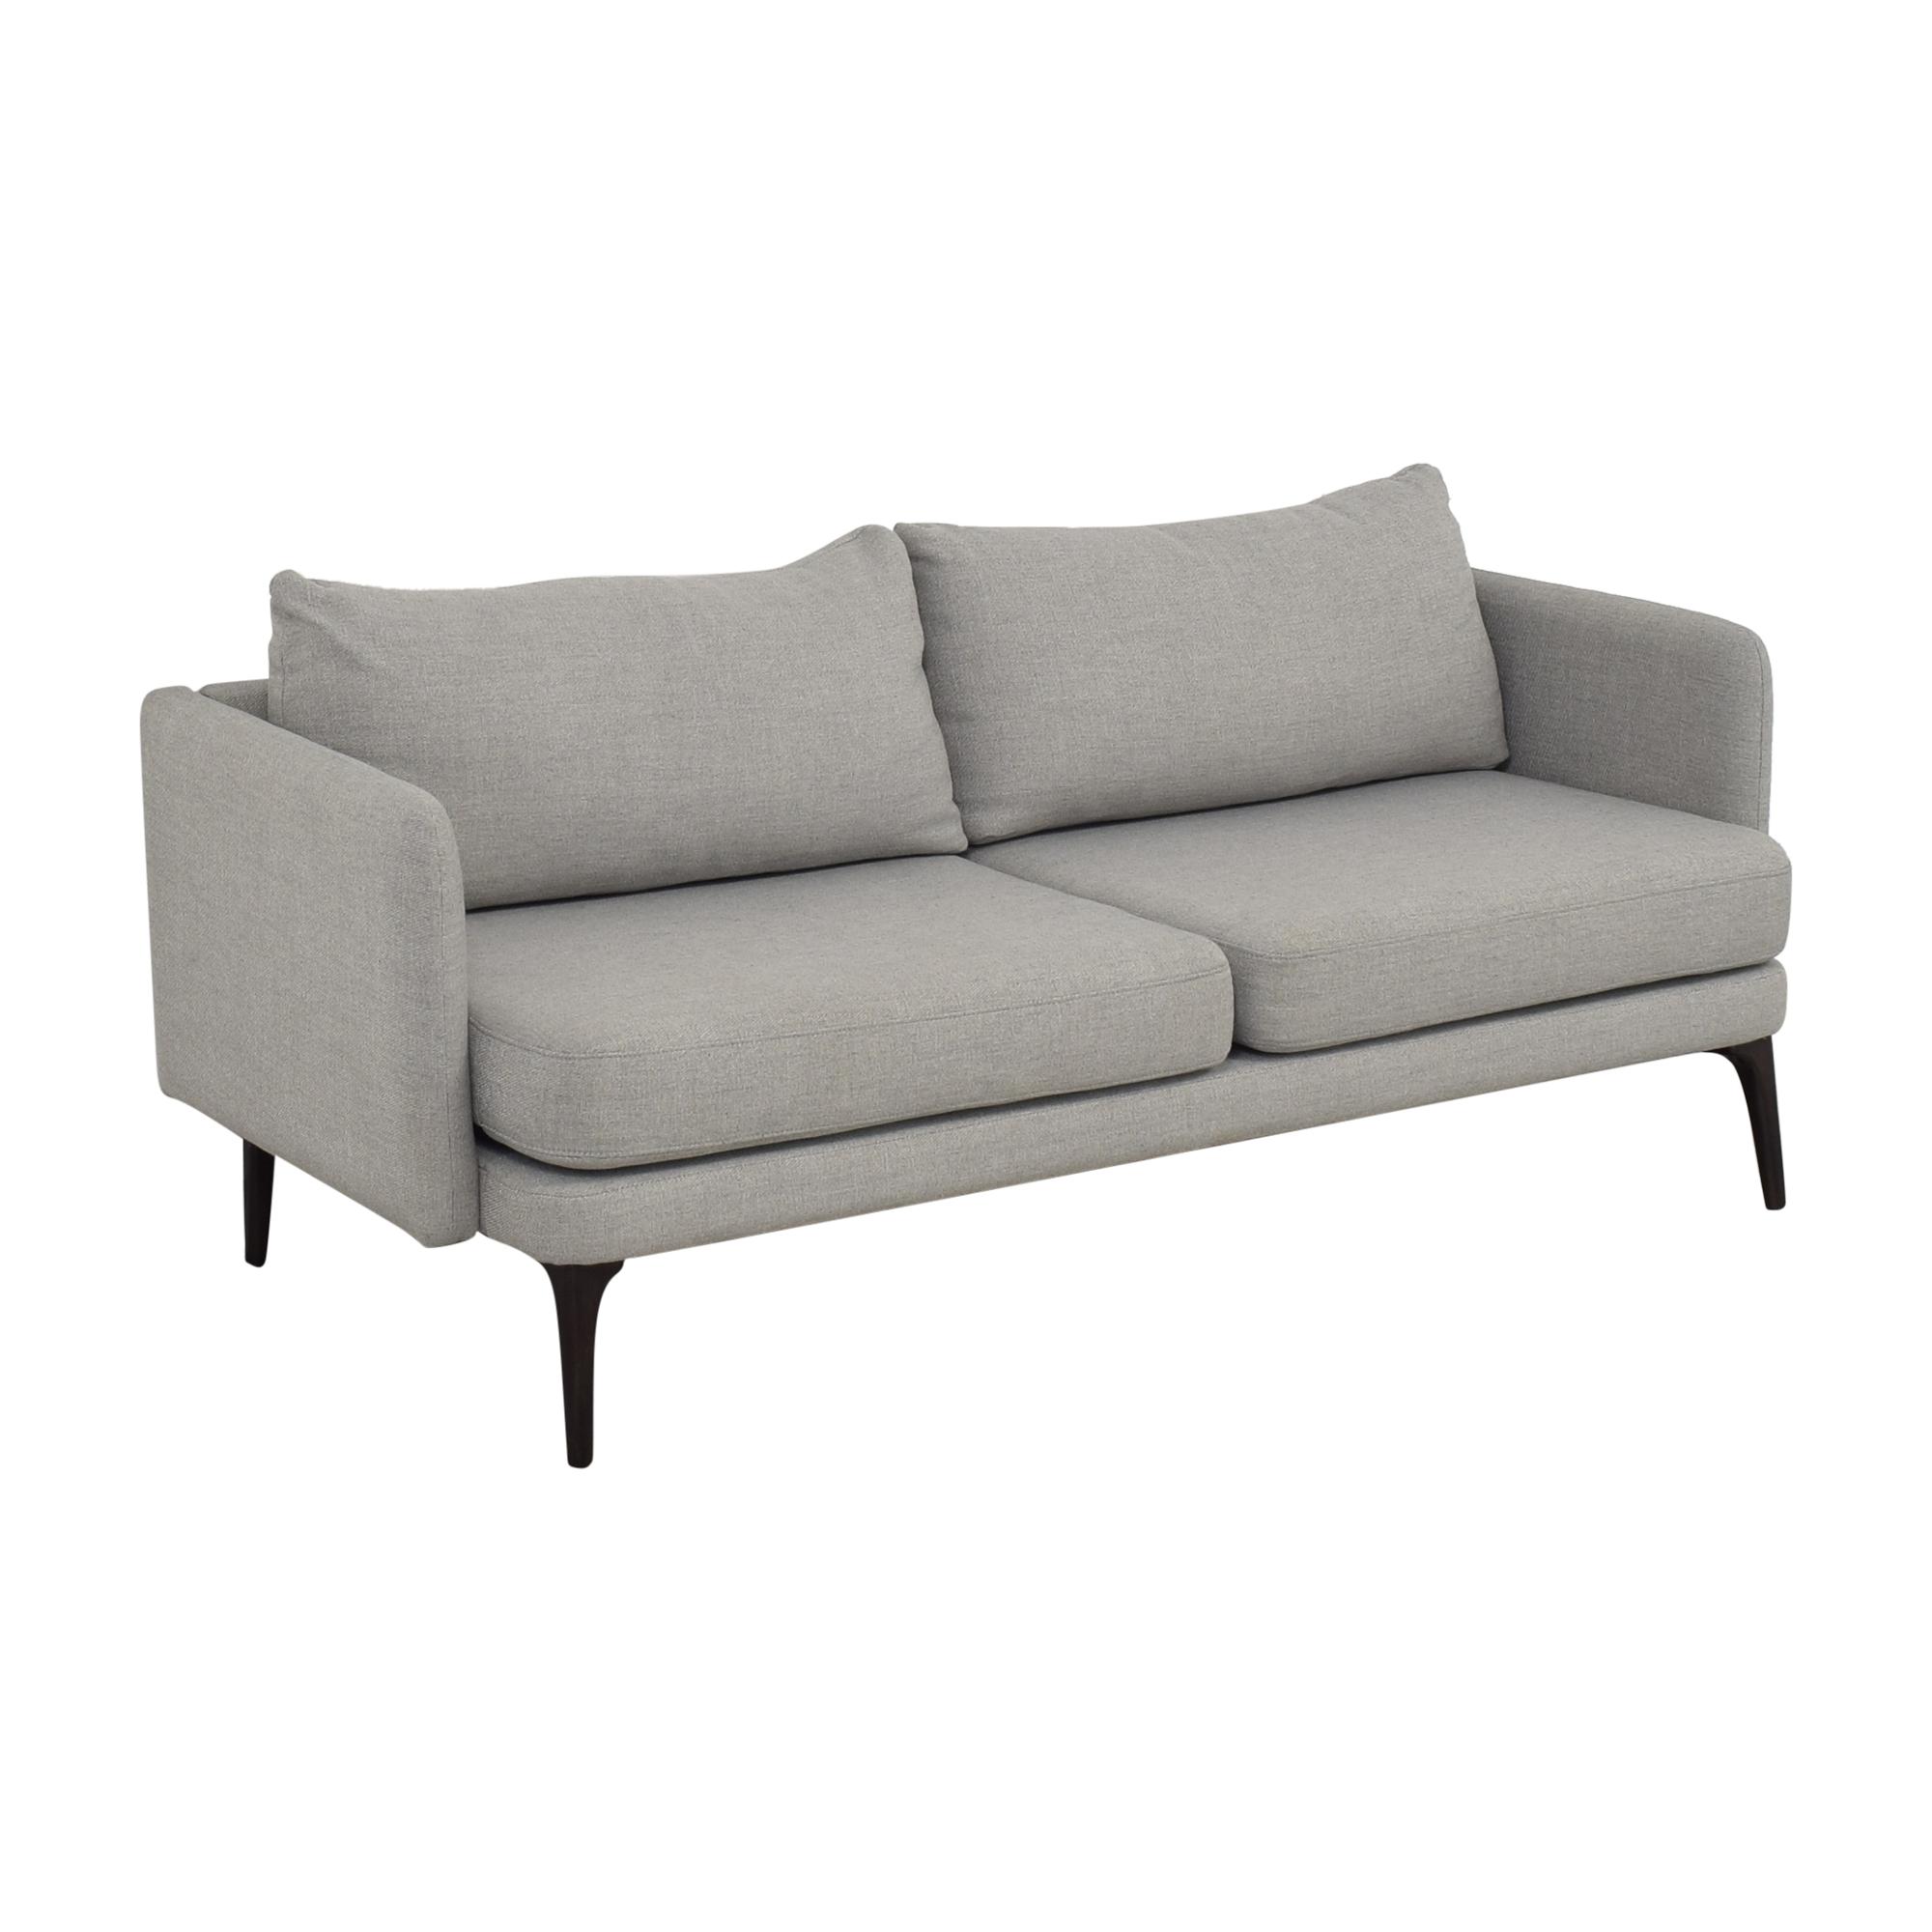 West Elm Auburn Sofa / Loveseats